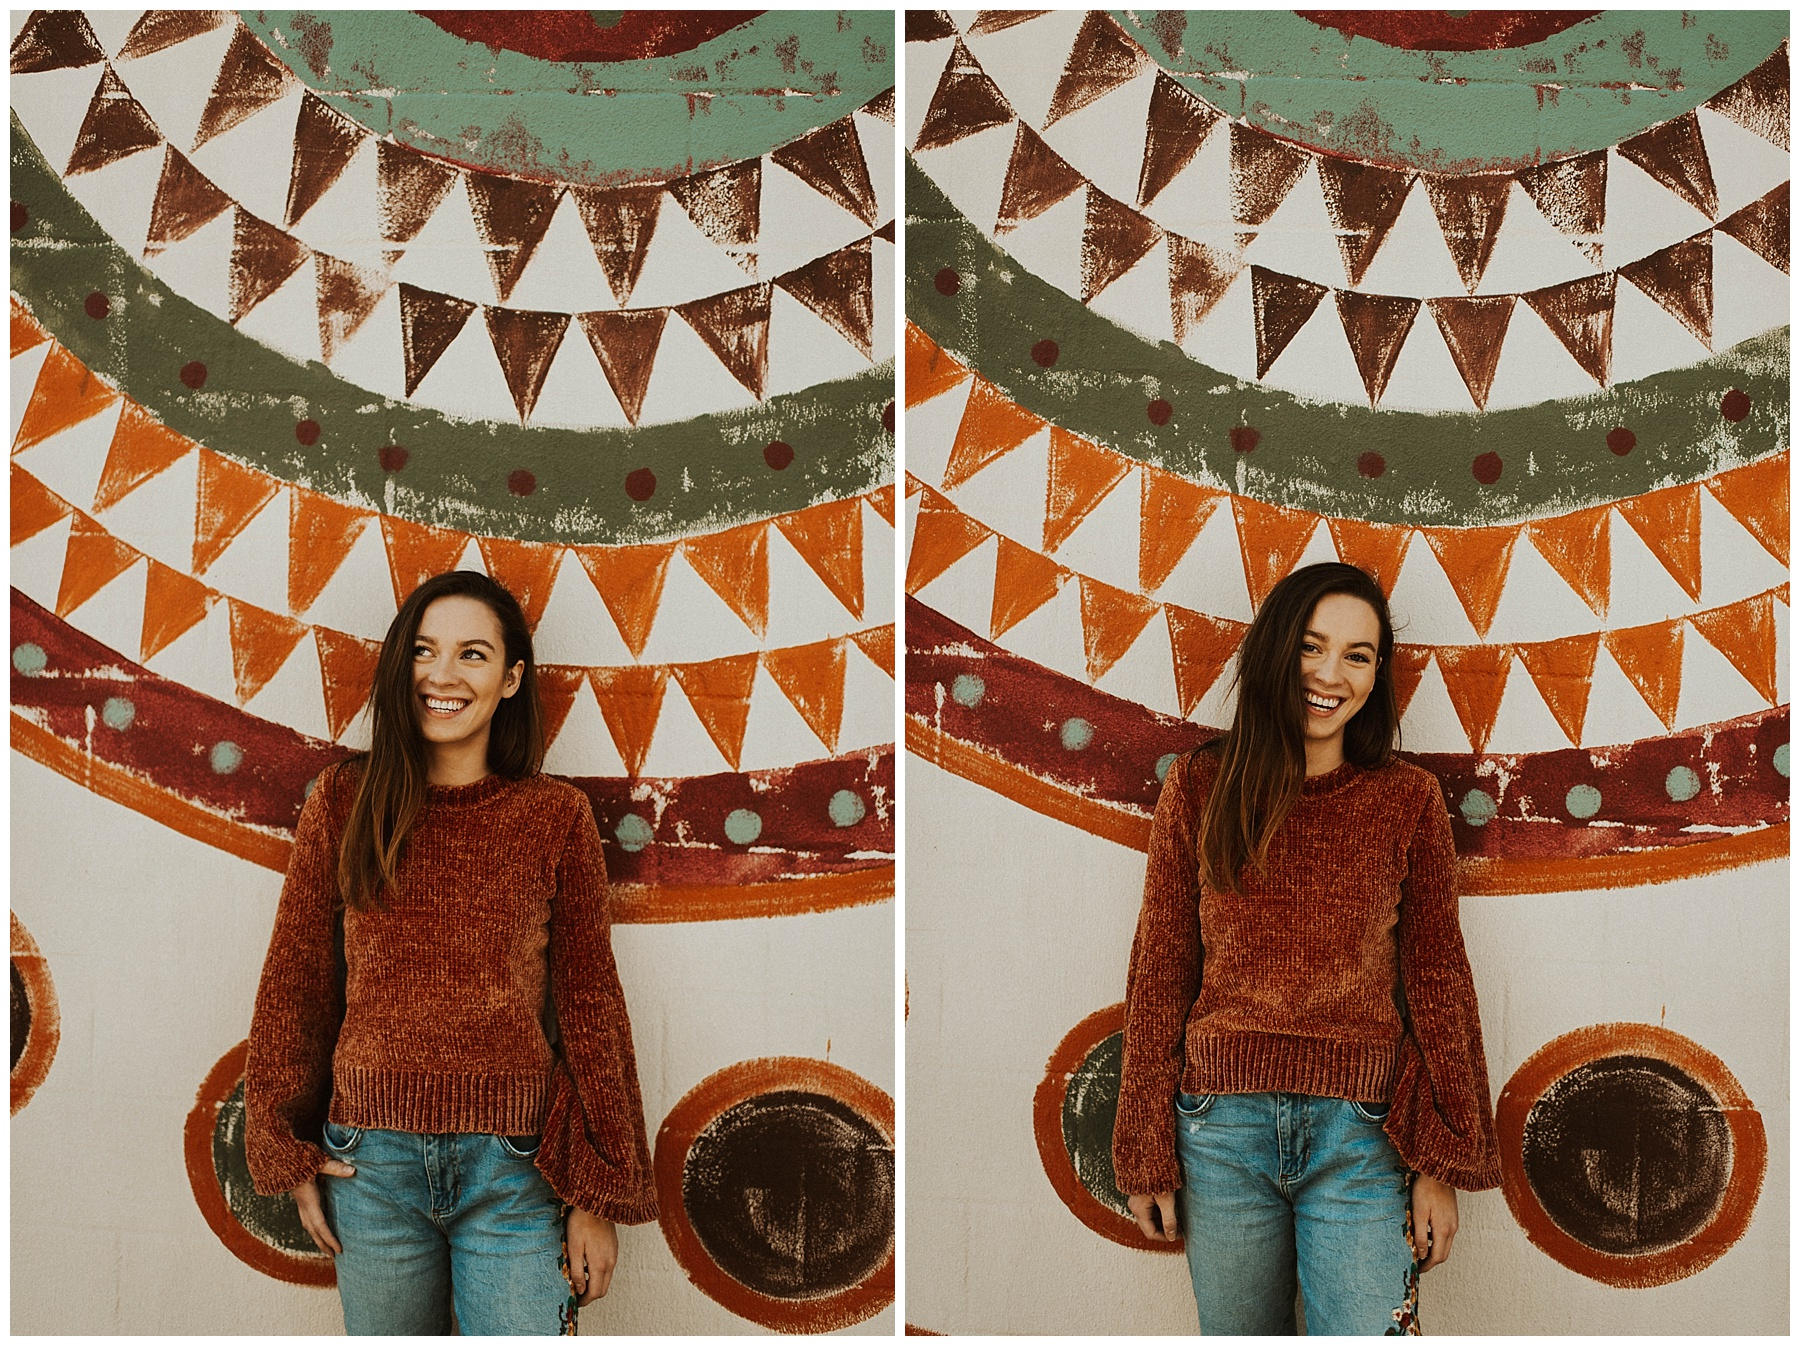 Sabrina Candid Portraits Lauren F.otography | Central